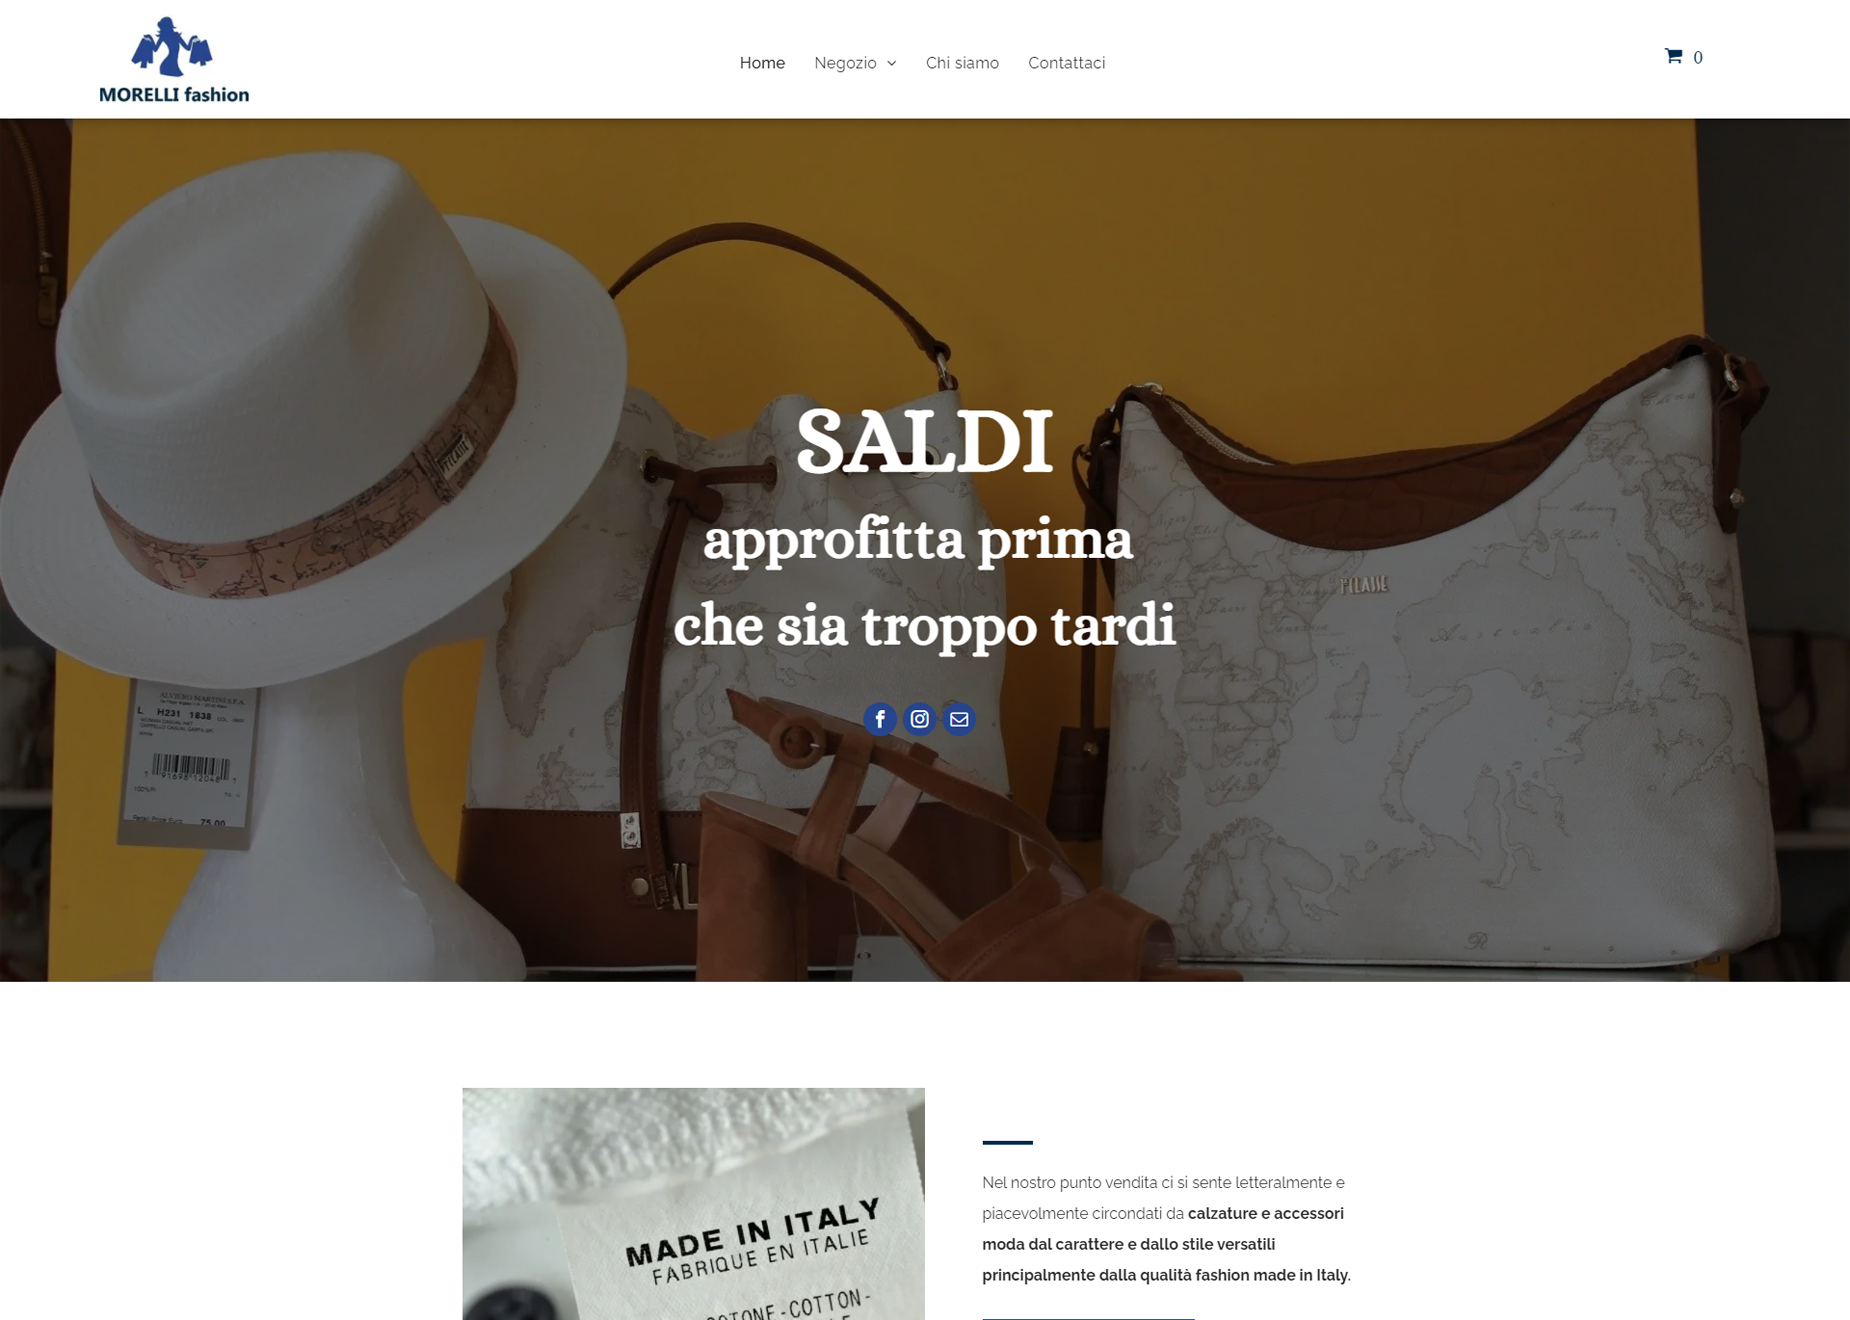 Morelli Fashion